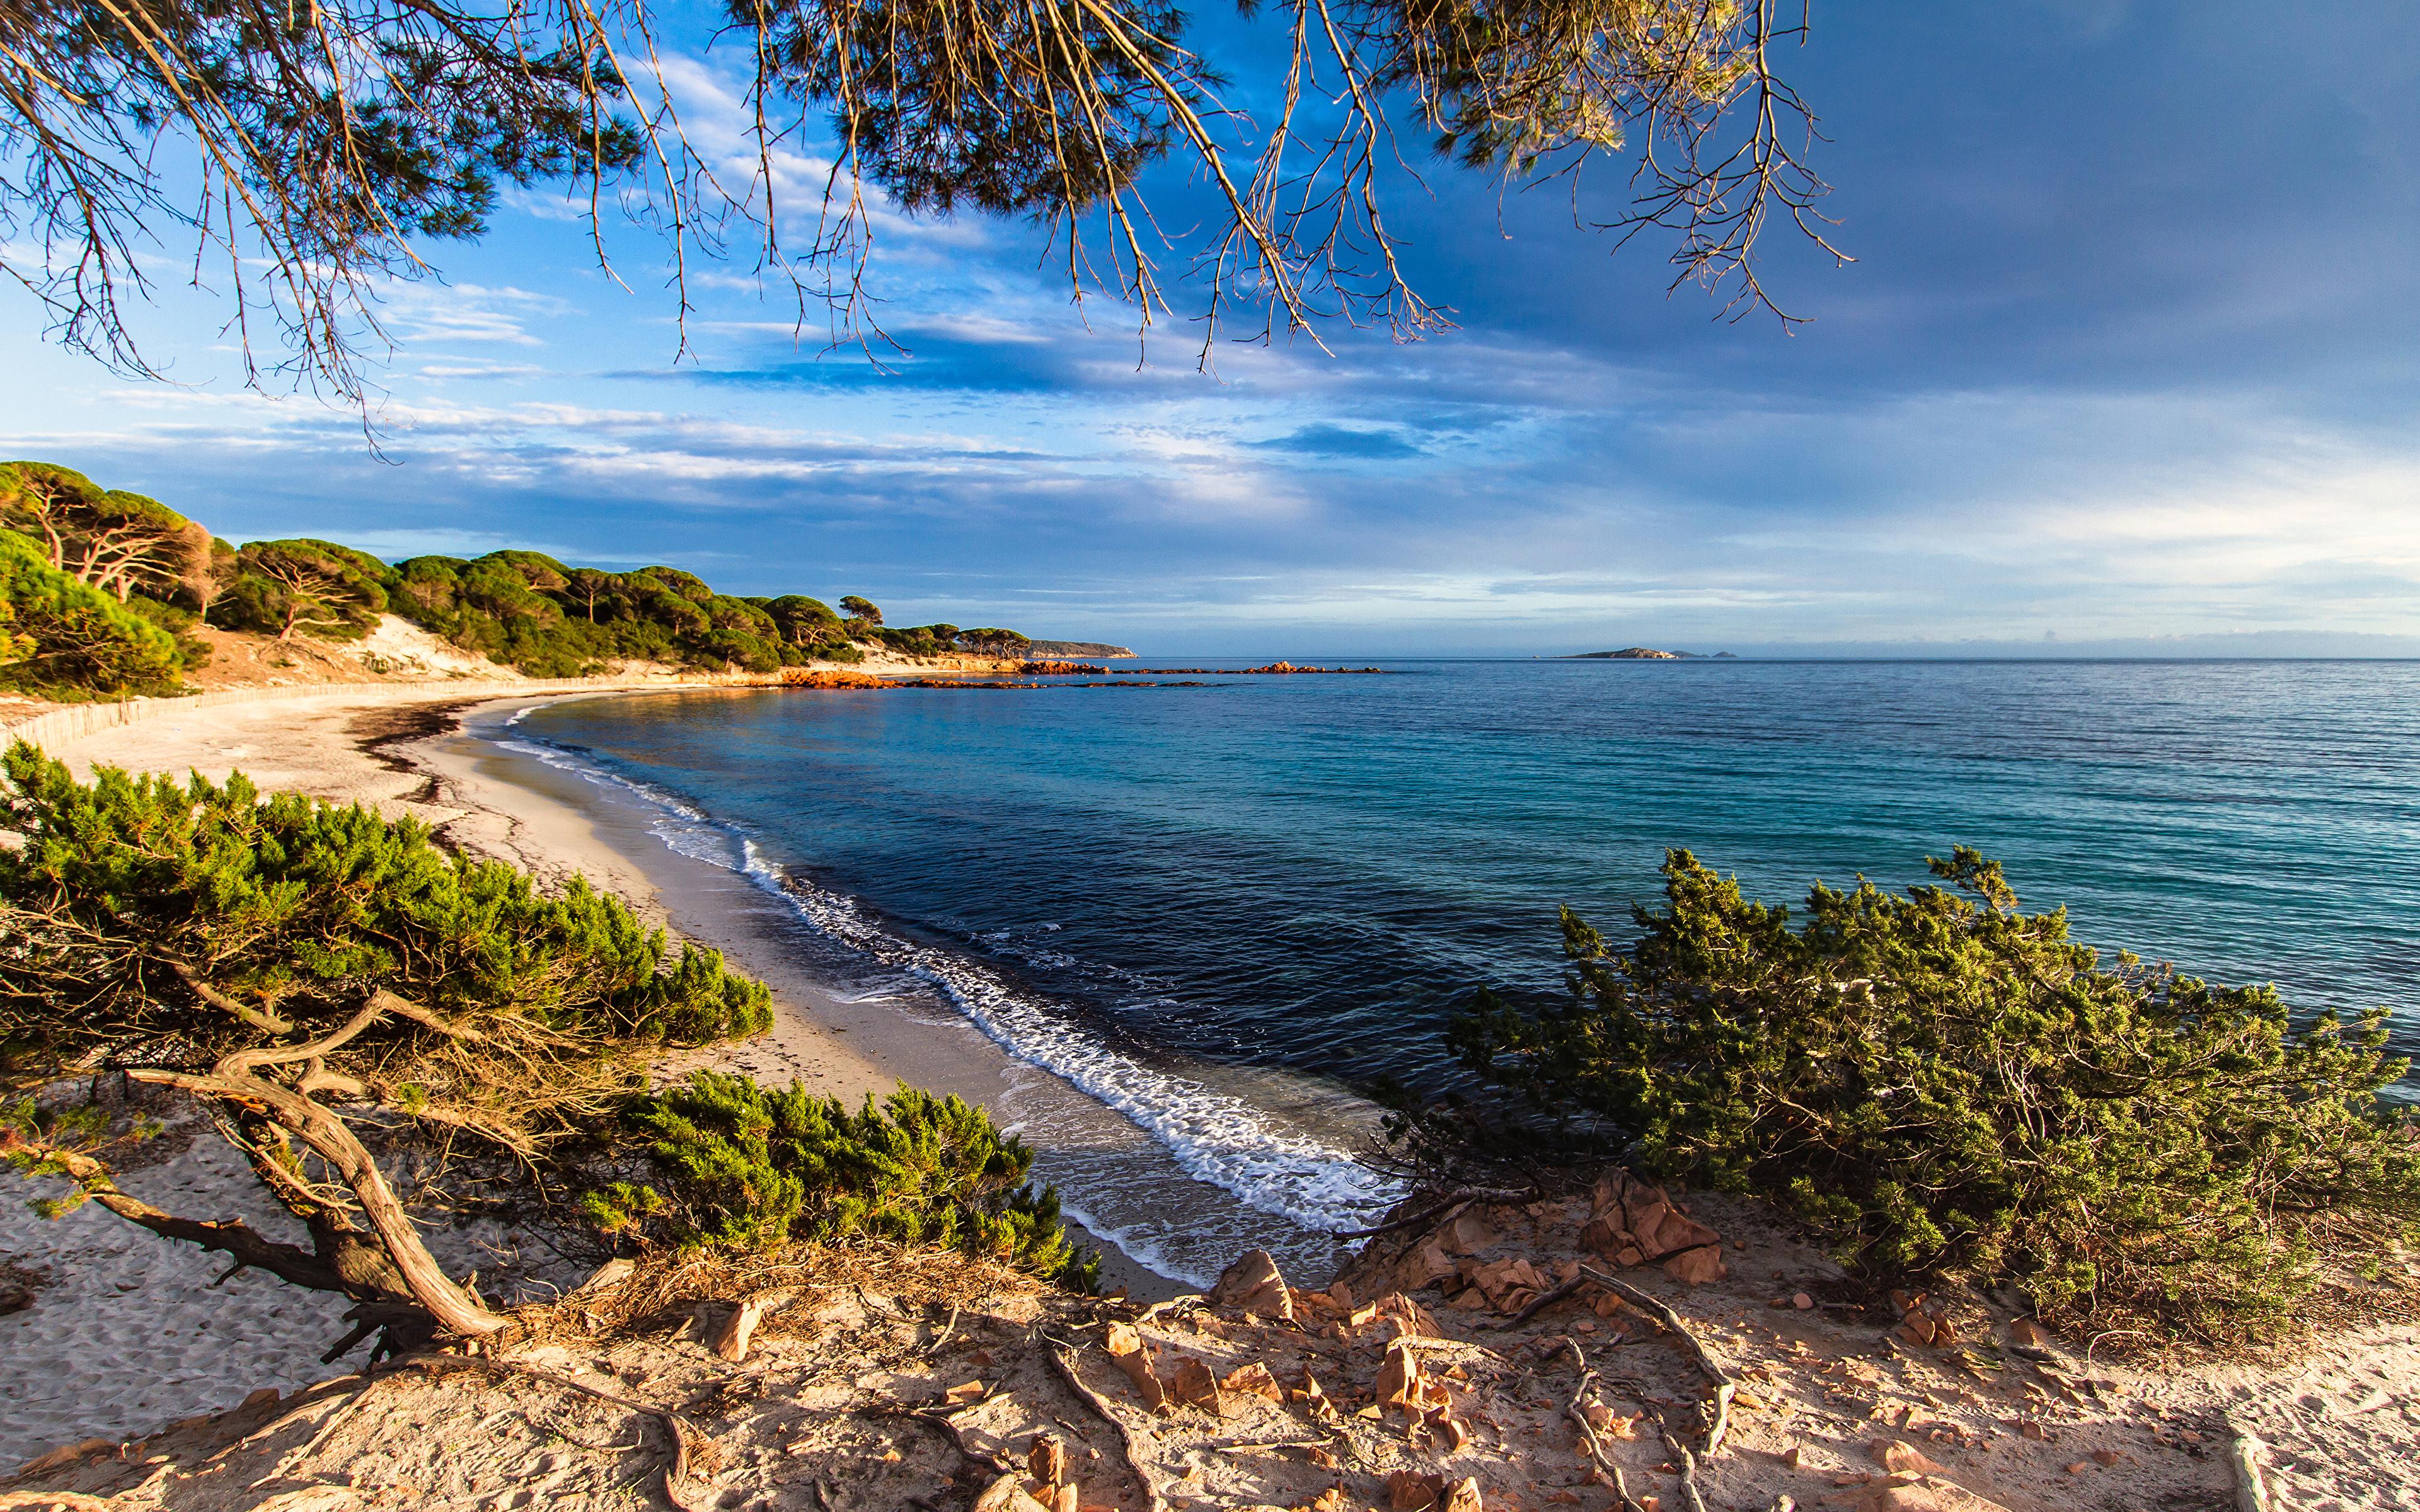 Desktop Wallpapers France Corsica Nature Waves Coast 3840x2400 3840x2400